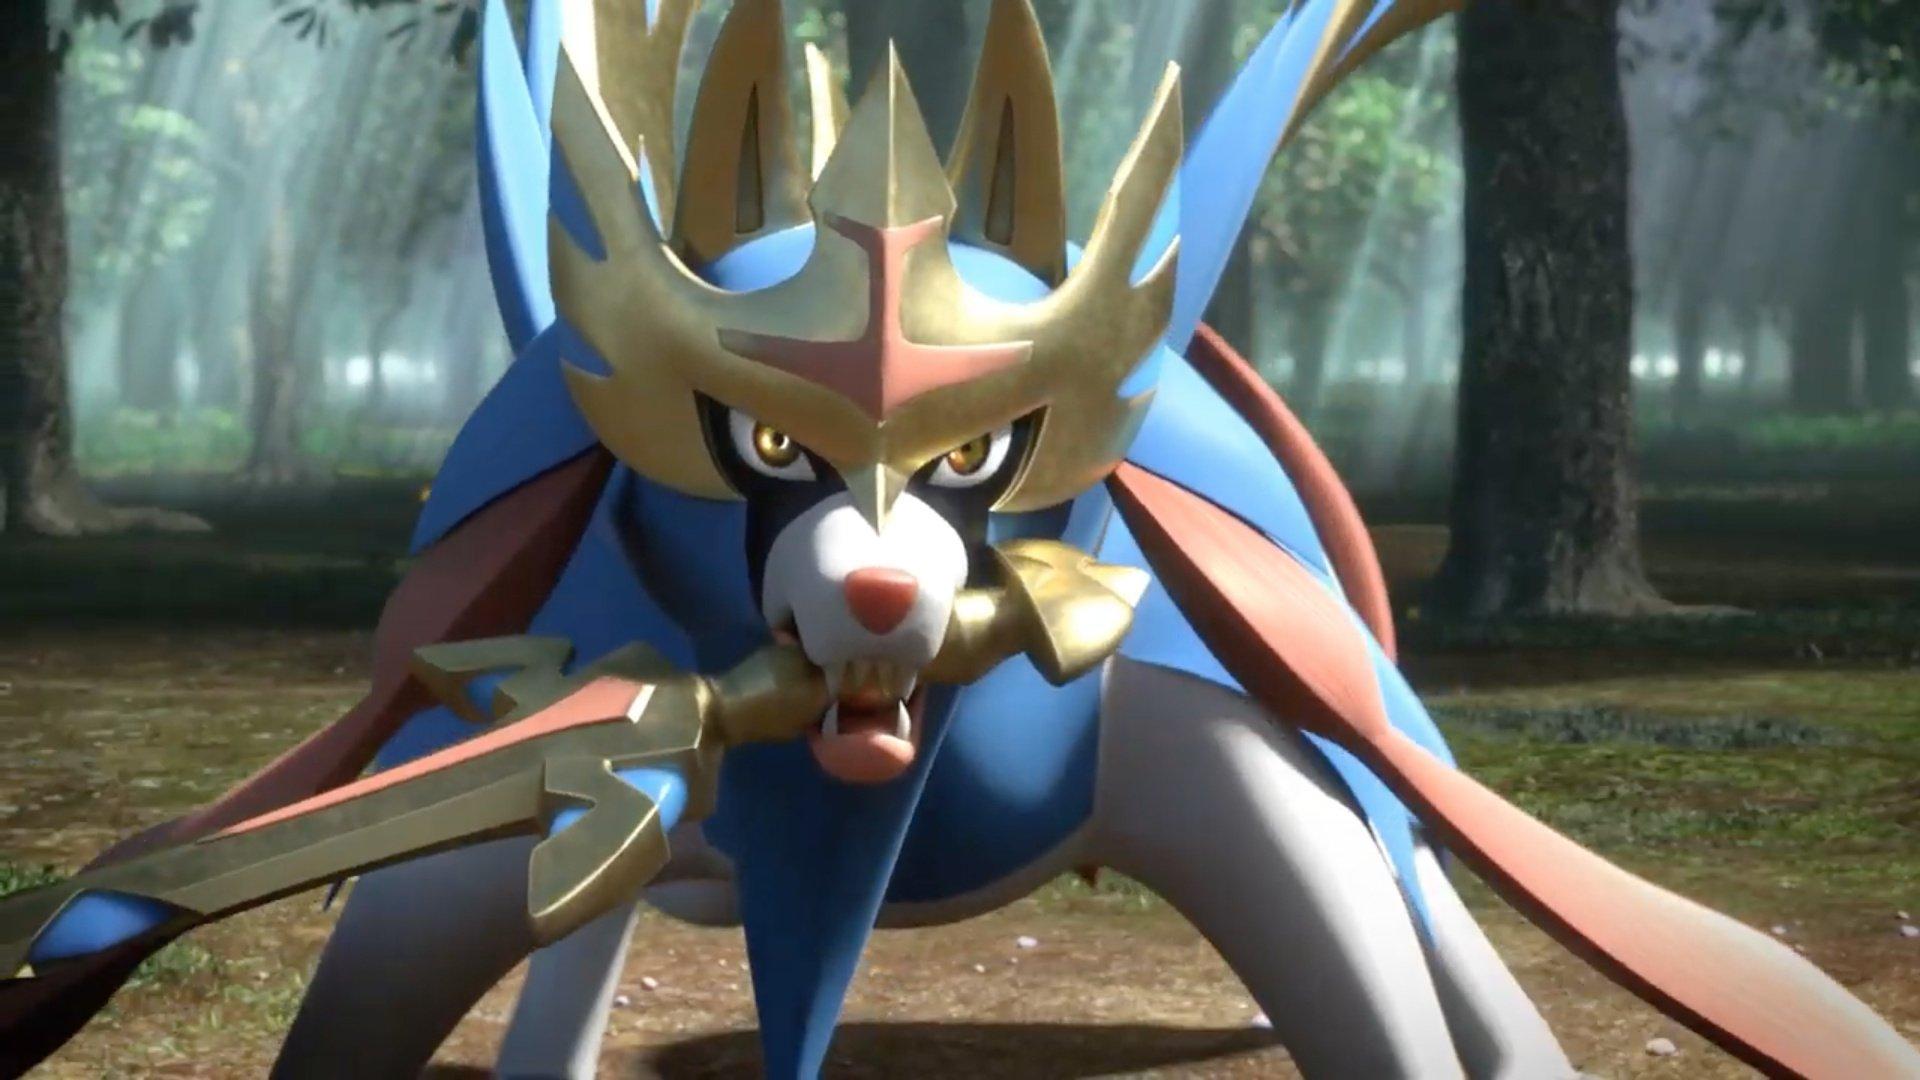 Random: Bandai Namco Thinks Pokémon's New Legendary Looks